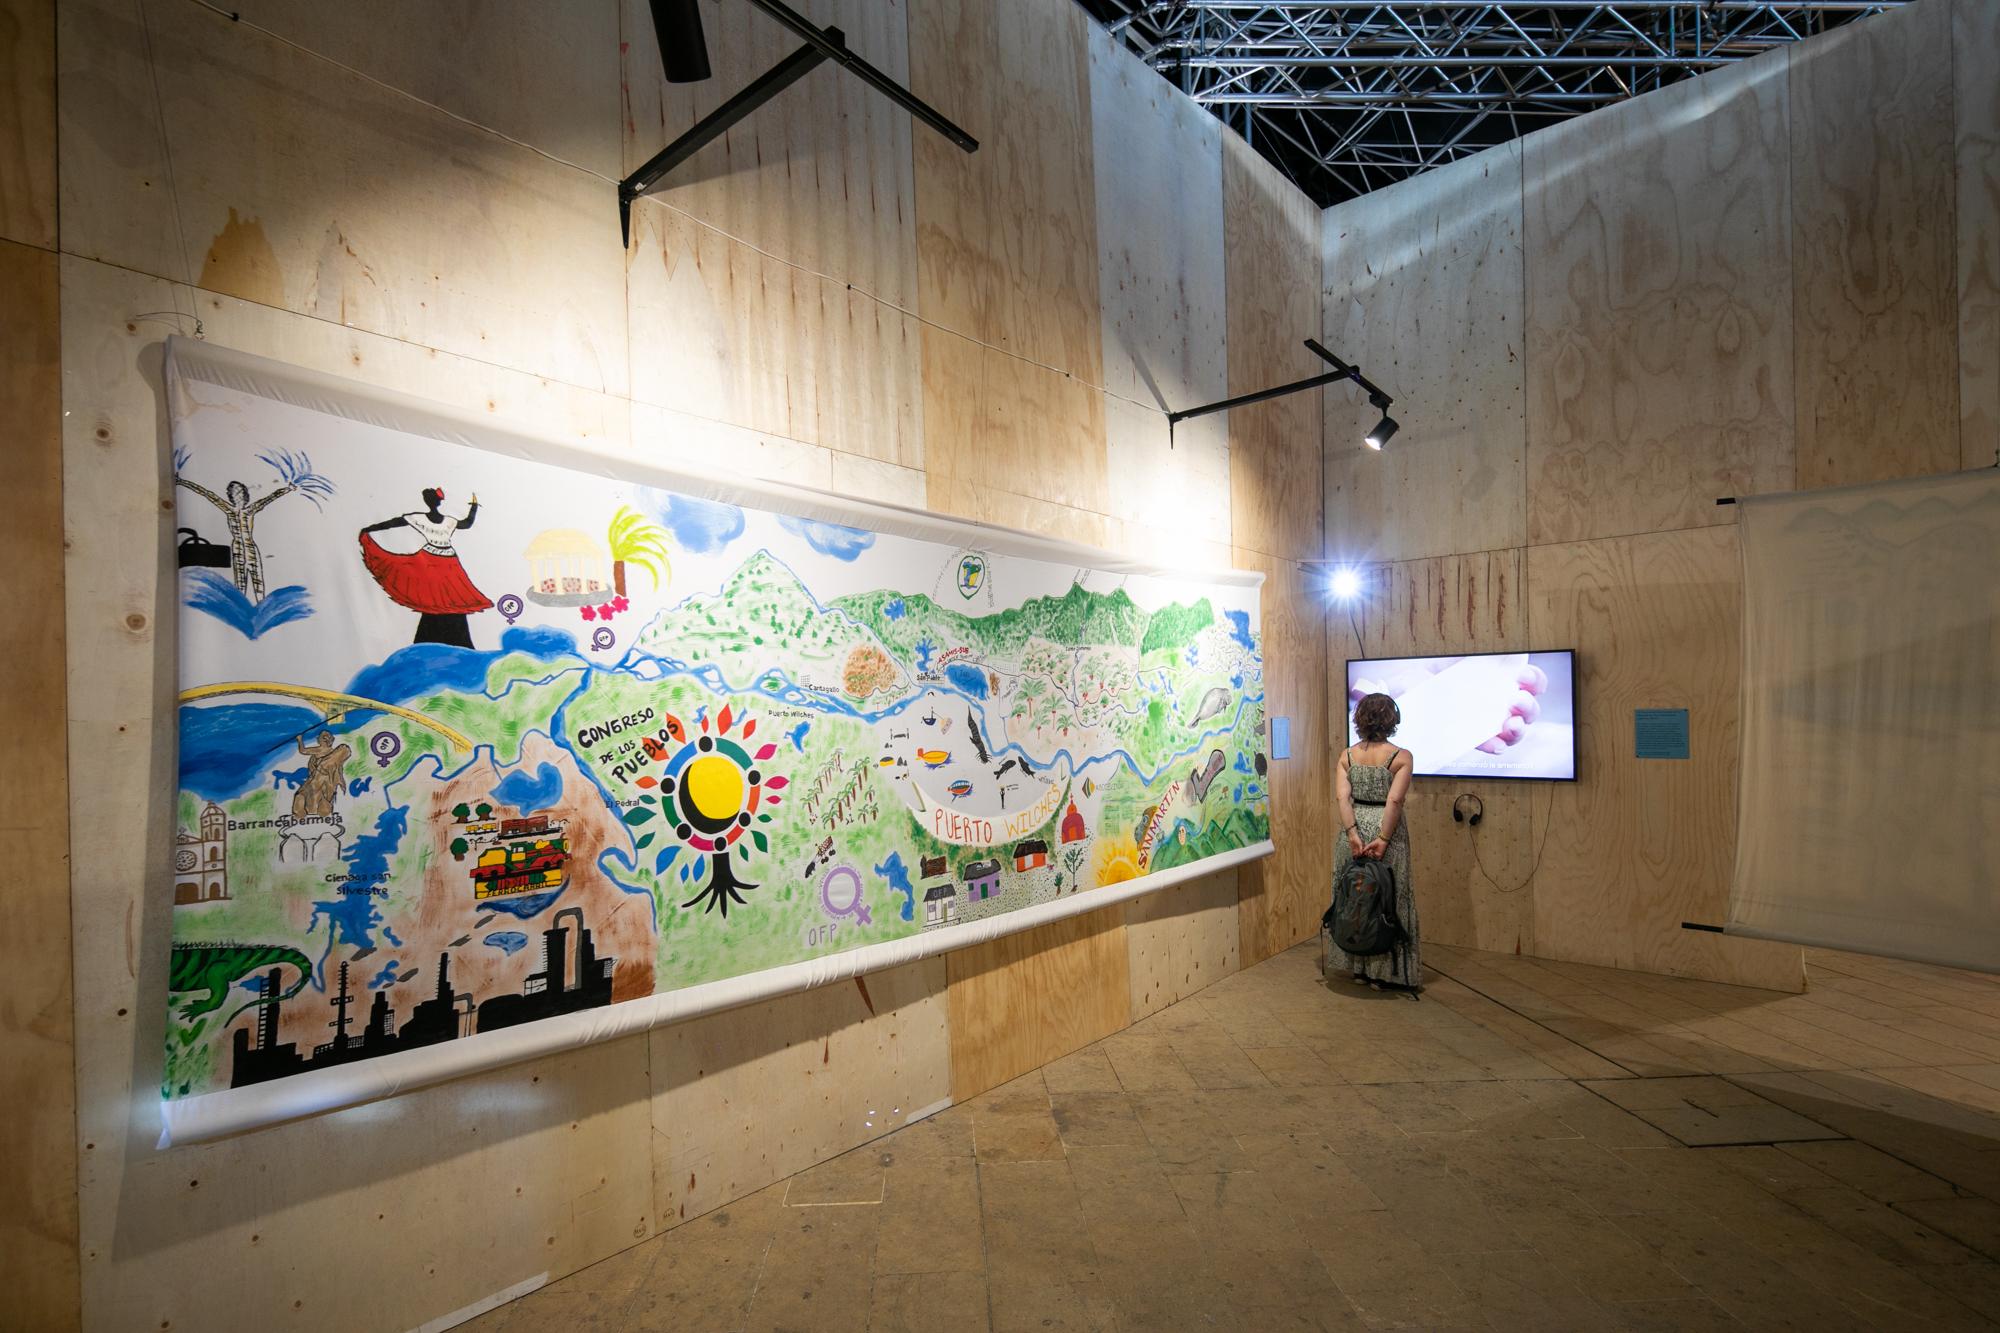 Pabellón Museo de Memoria Histórica de Colombia  Medellín 2018